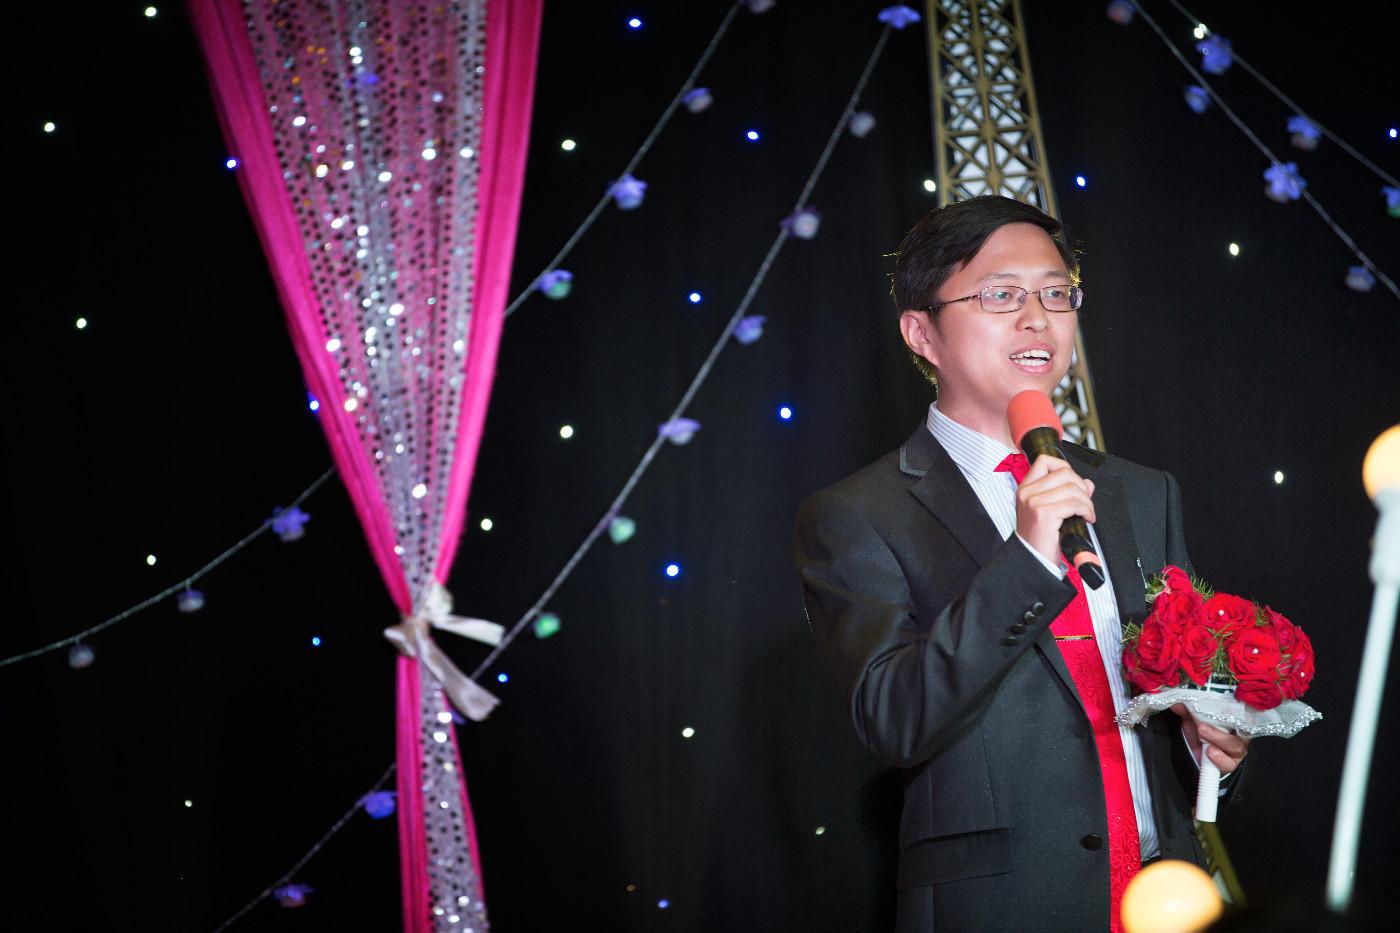 [KAI 婚礼纪实]安徽淮南T&Y37